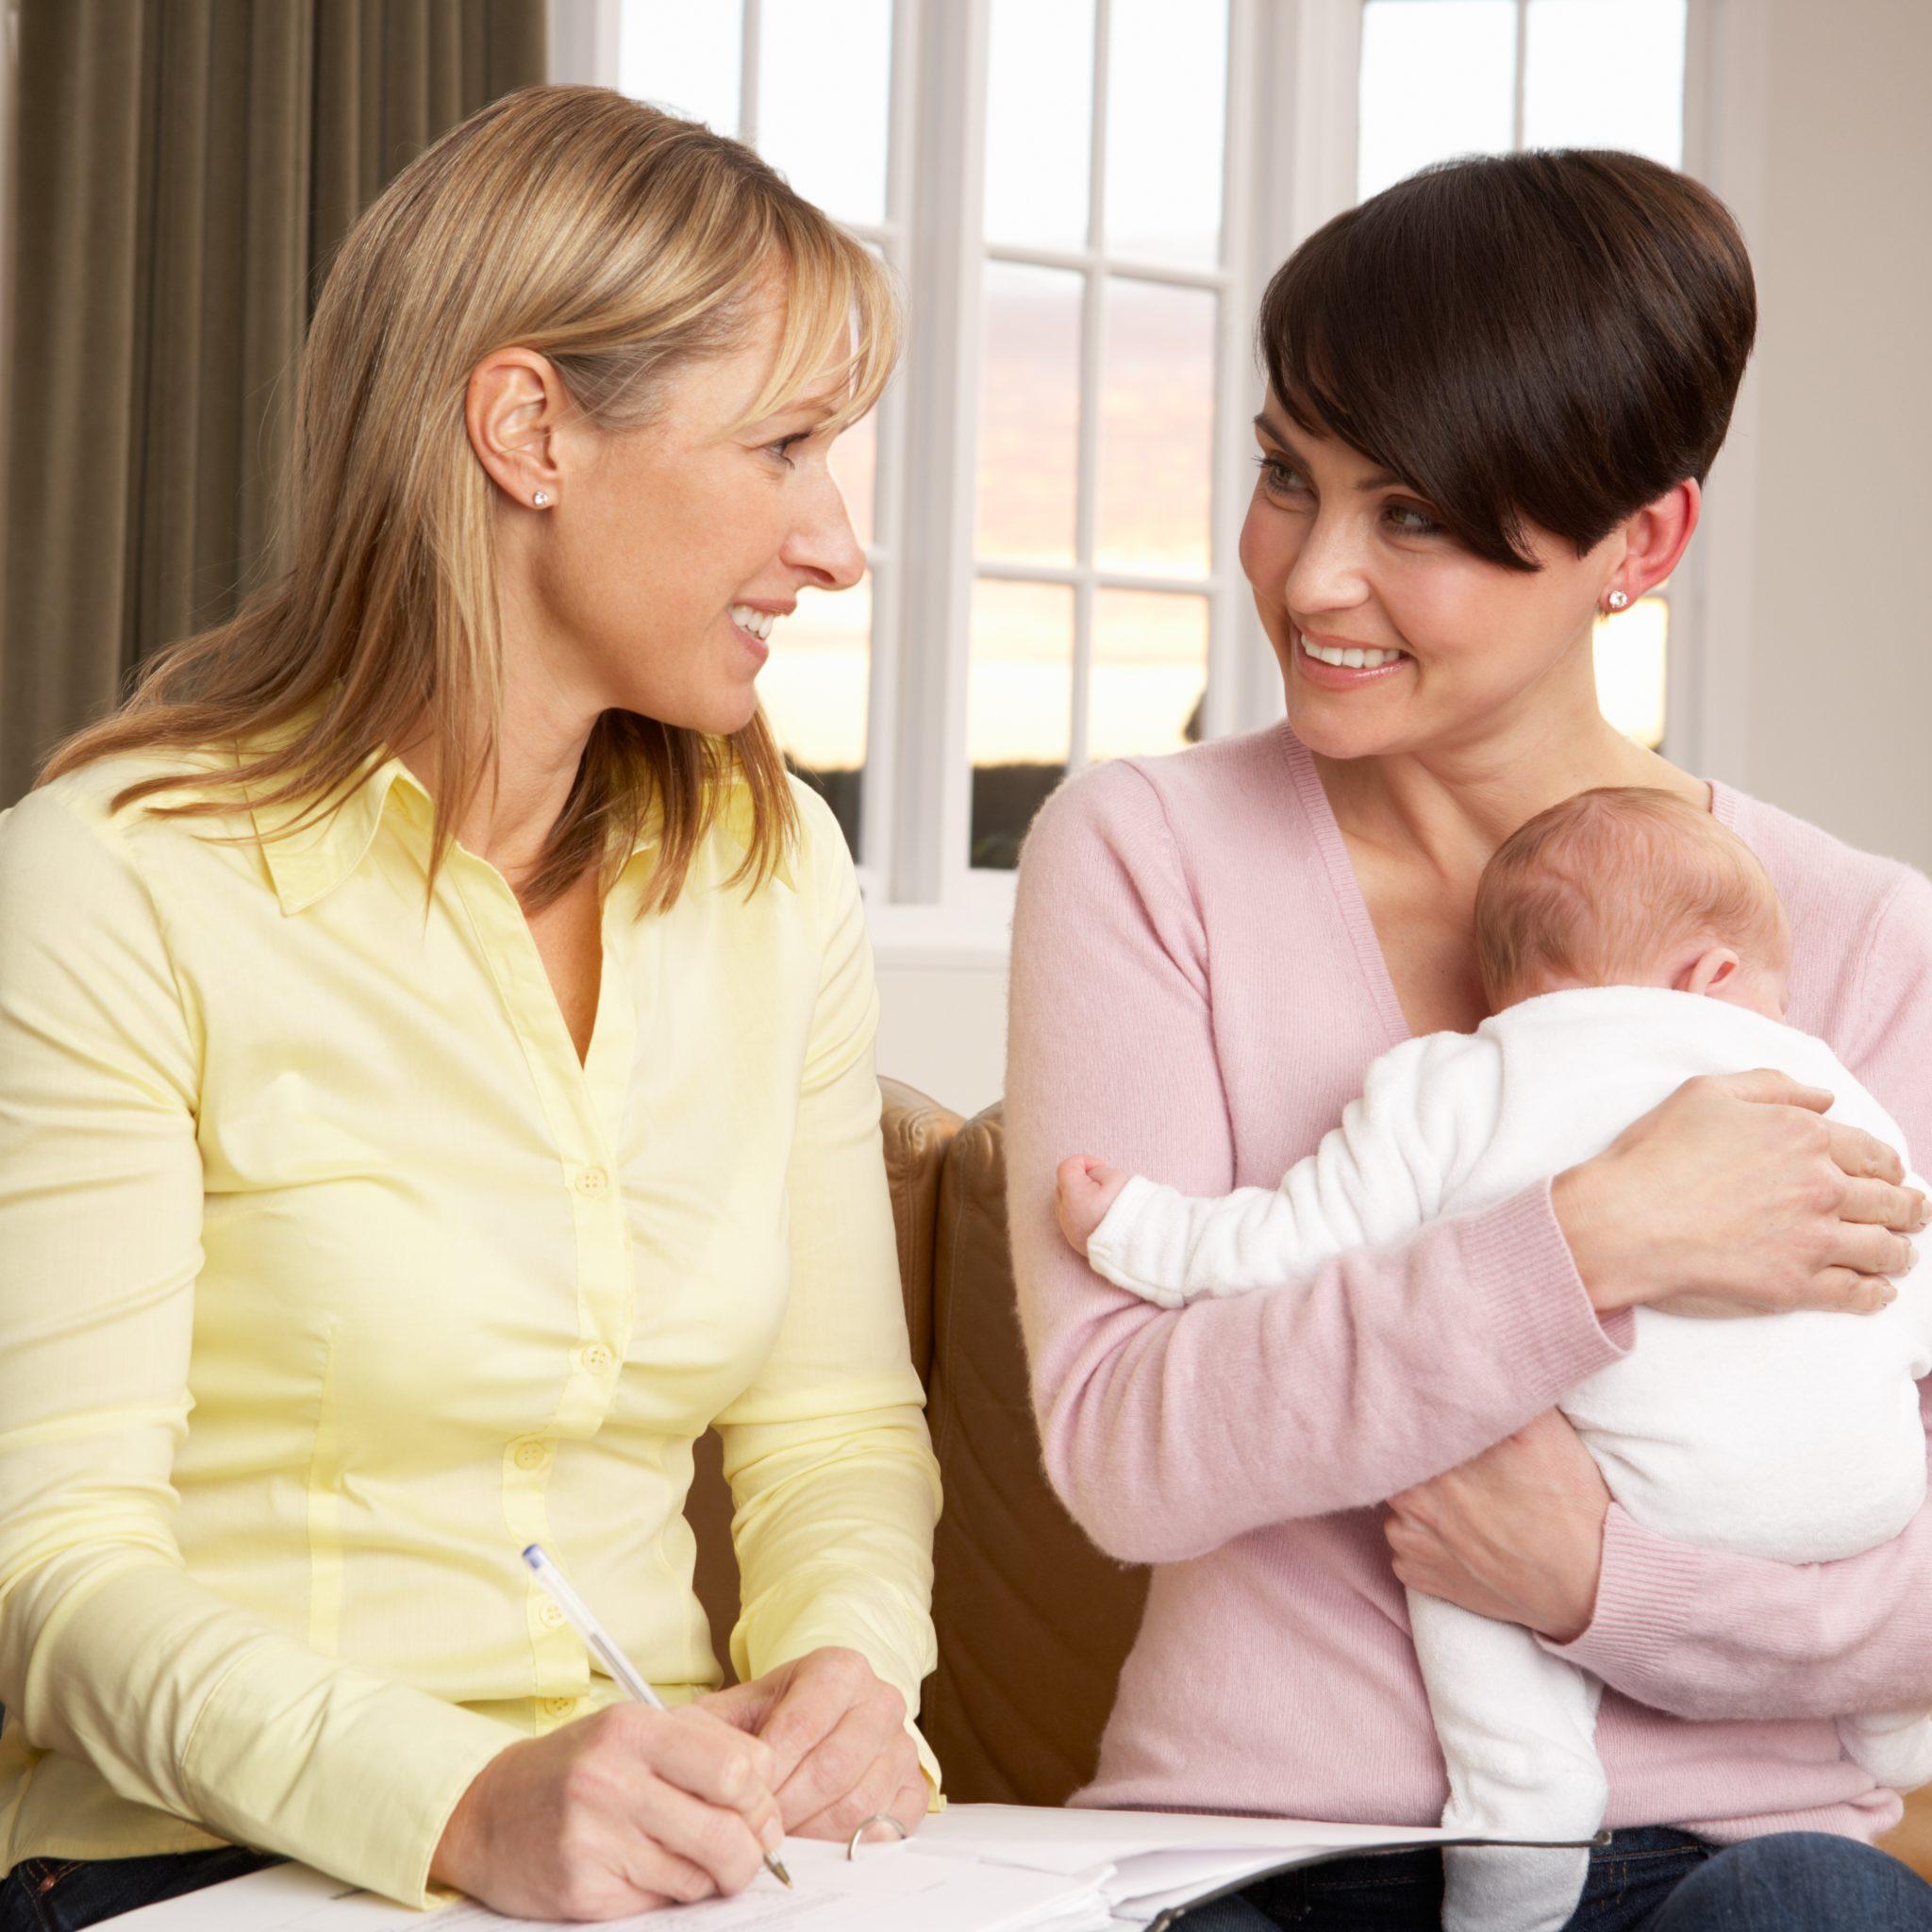 bigstock-Mother-With-Newborn-Baby-Talki-17604917